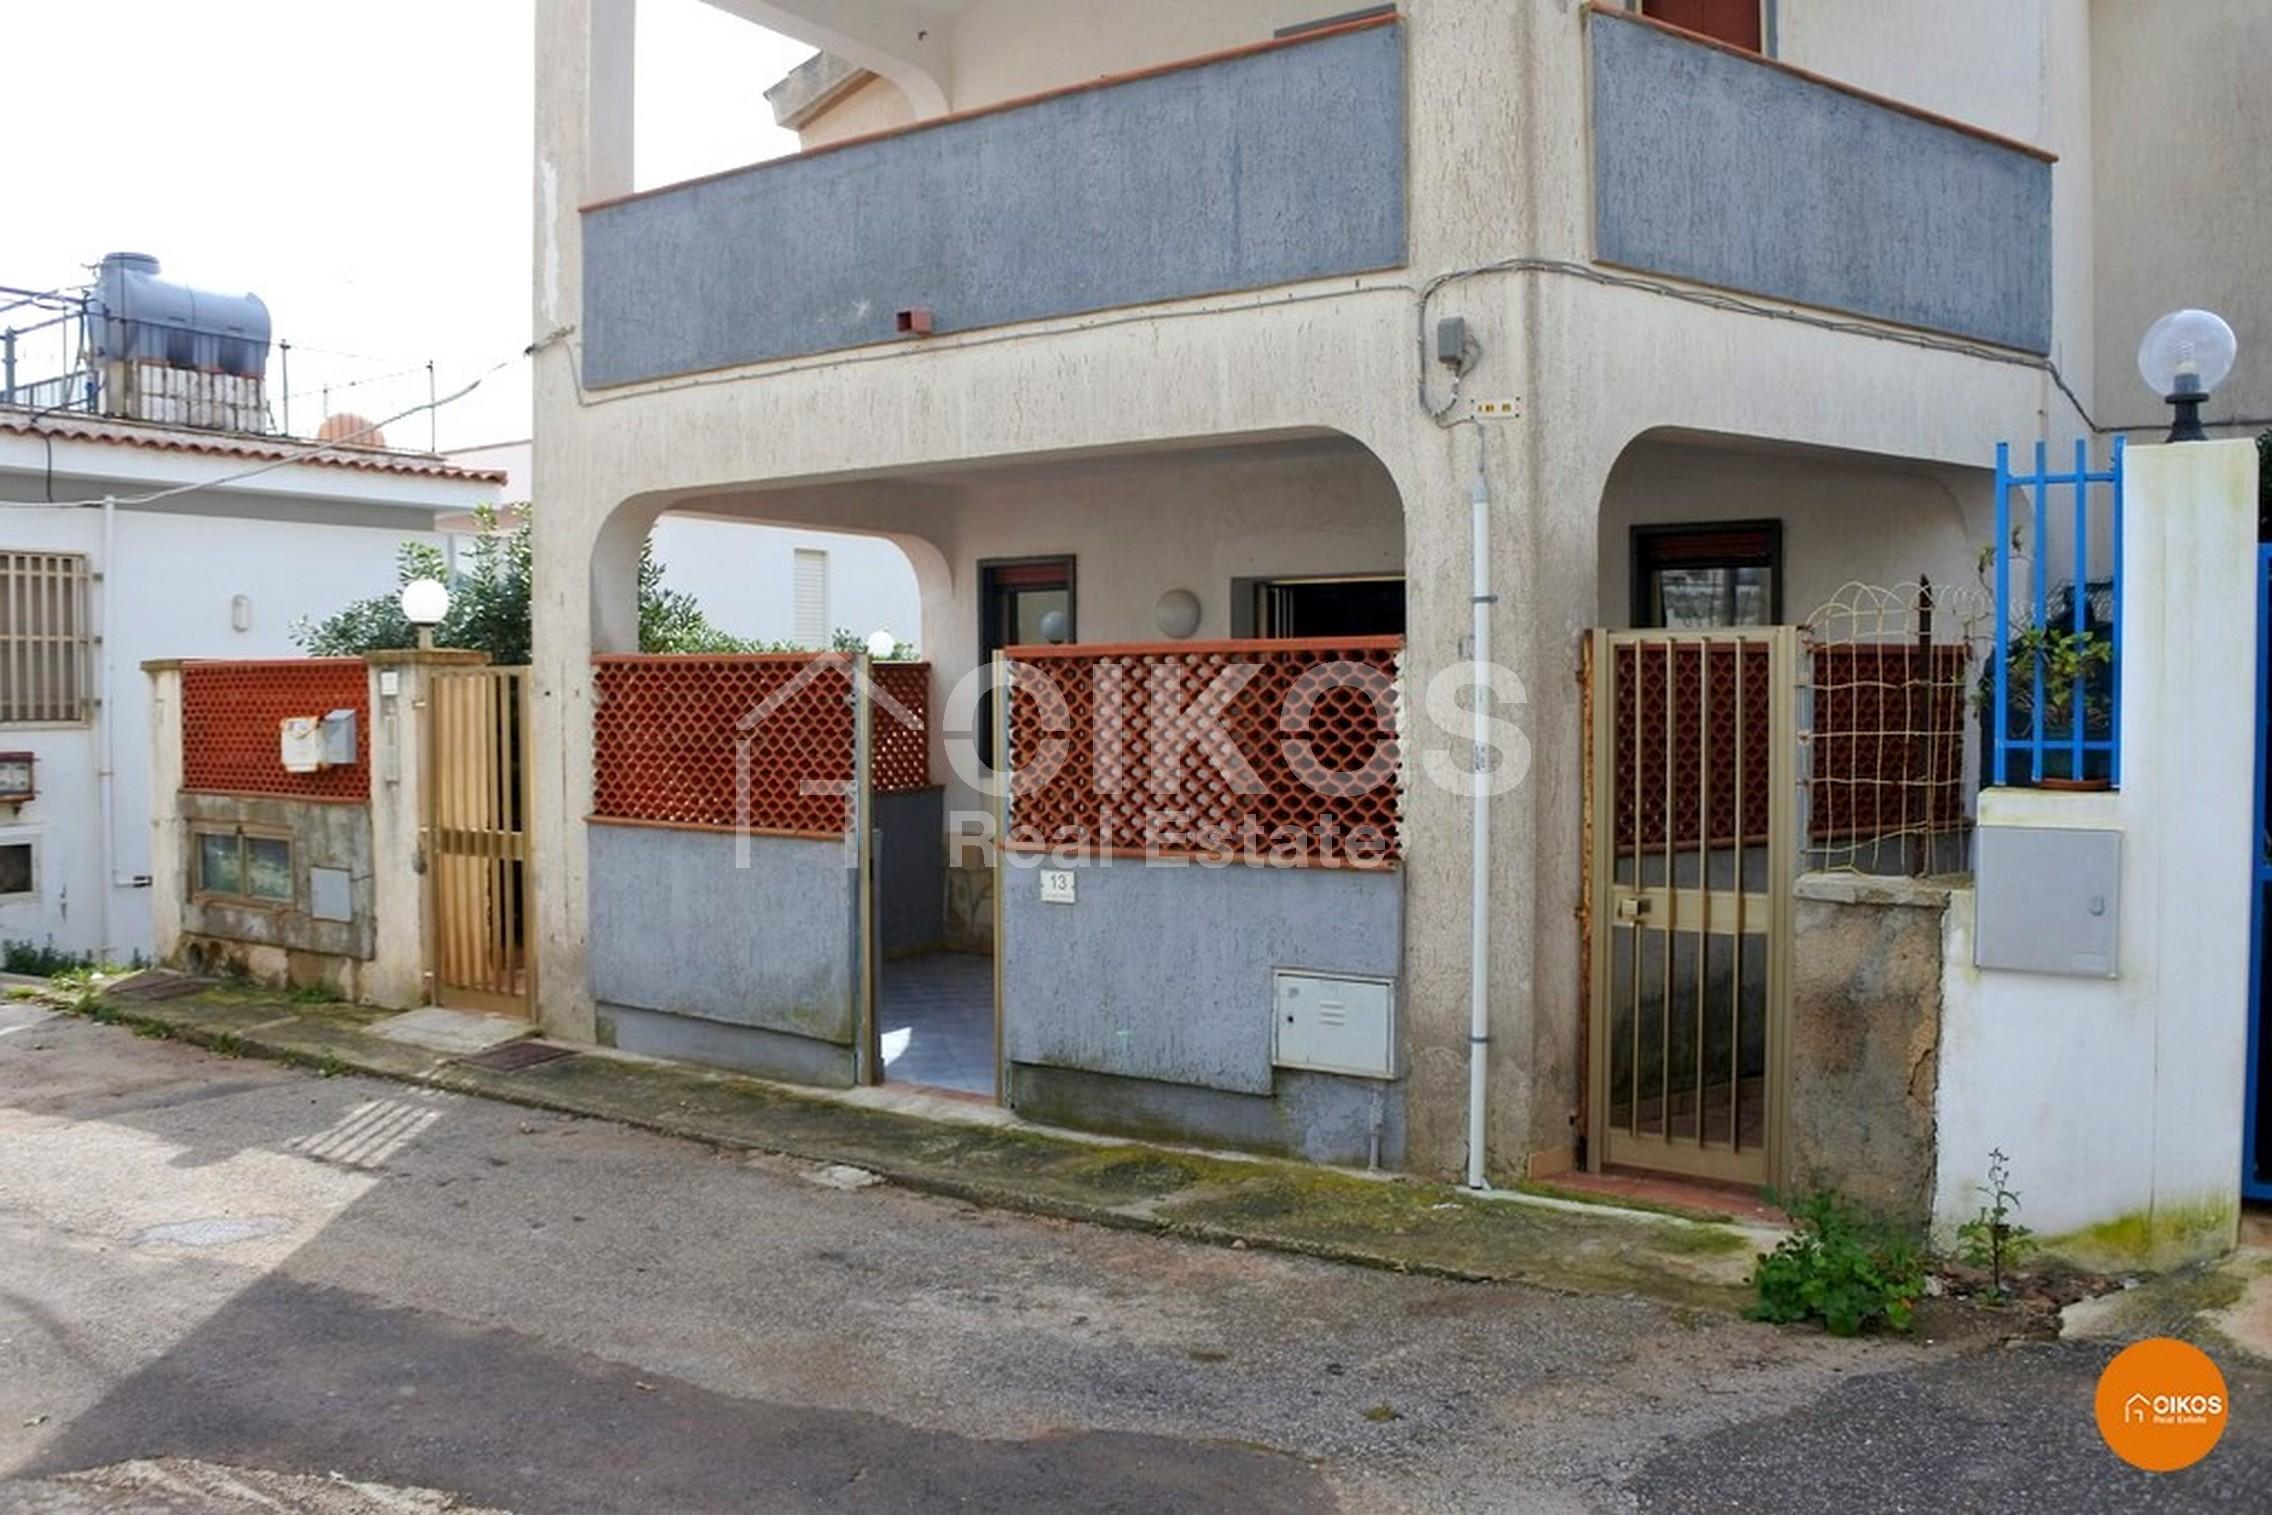 Casa in via Capopassero (1)